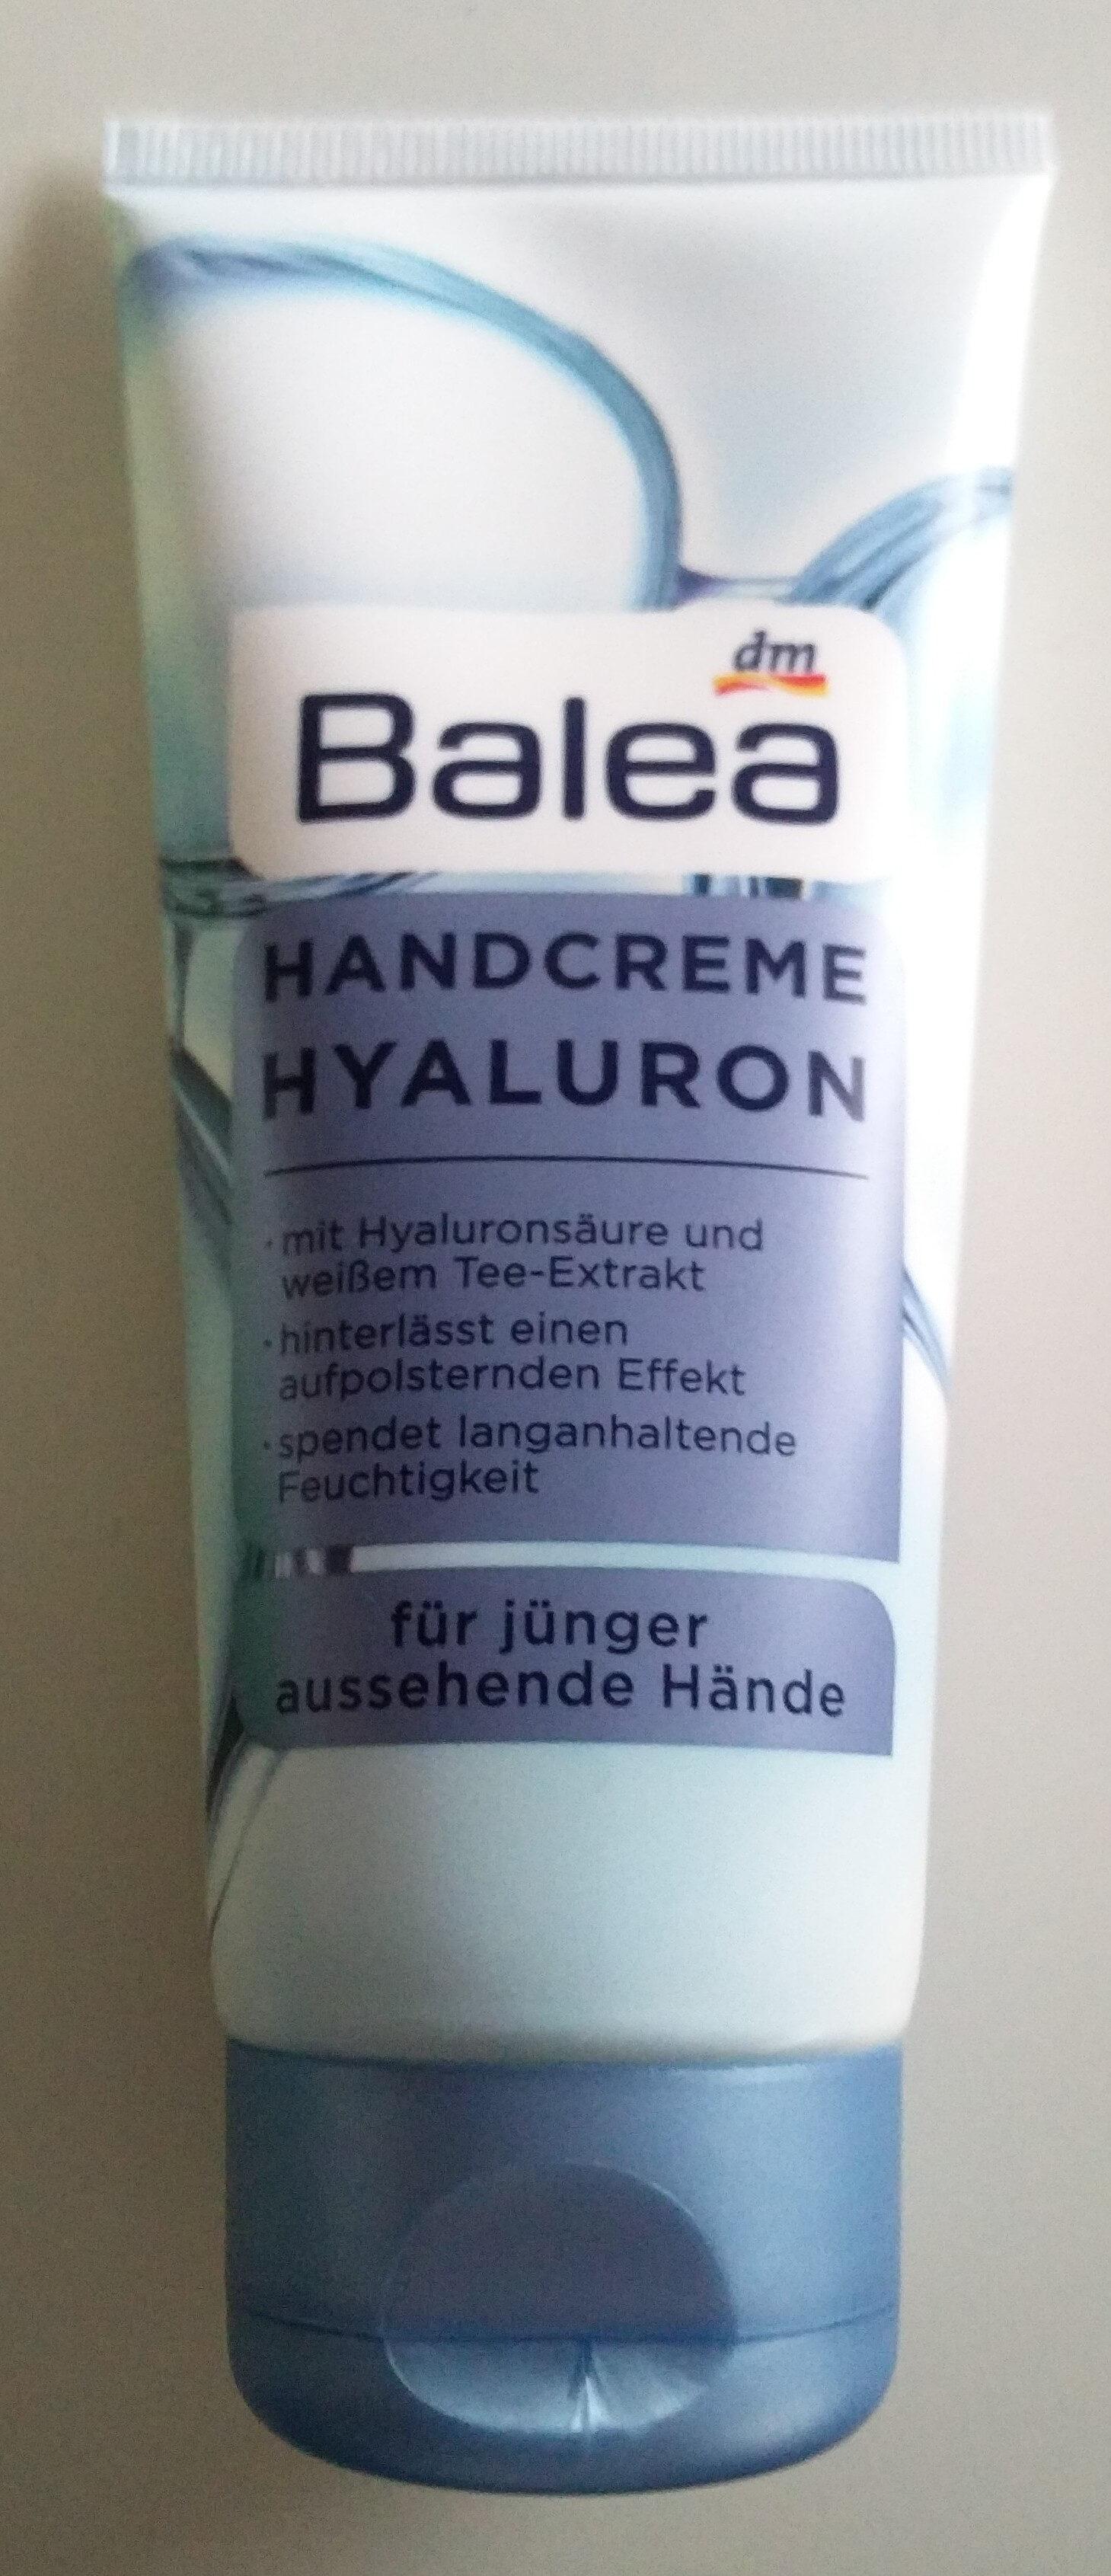 Handcreme Hyaluron - Product - de